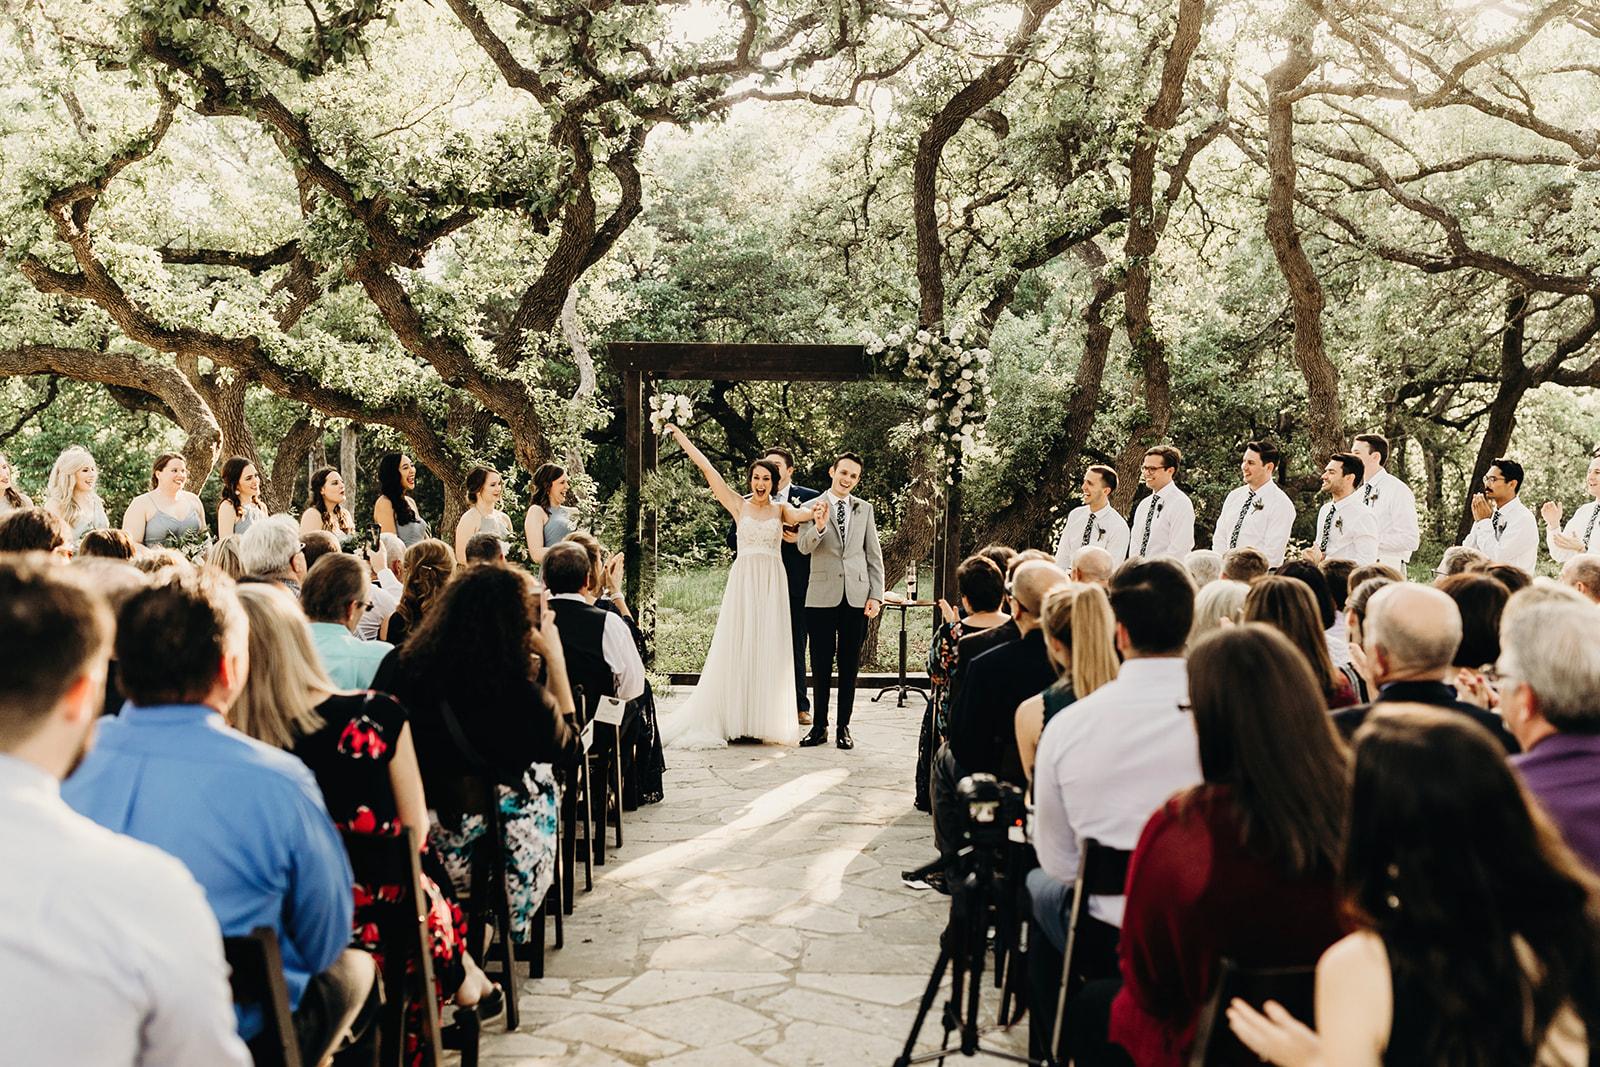 austin-wedding-lindsey-bryce-390.jpg